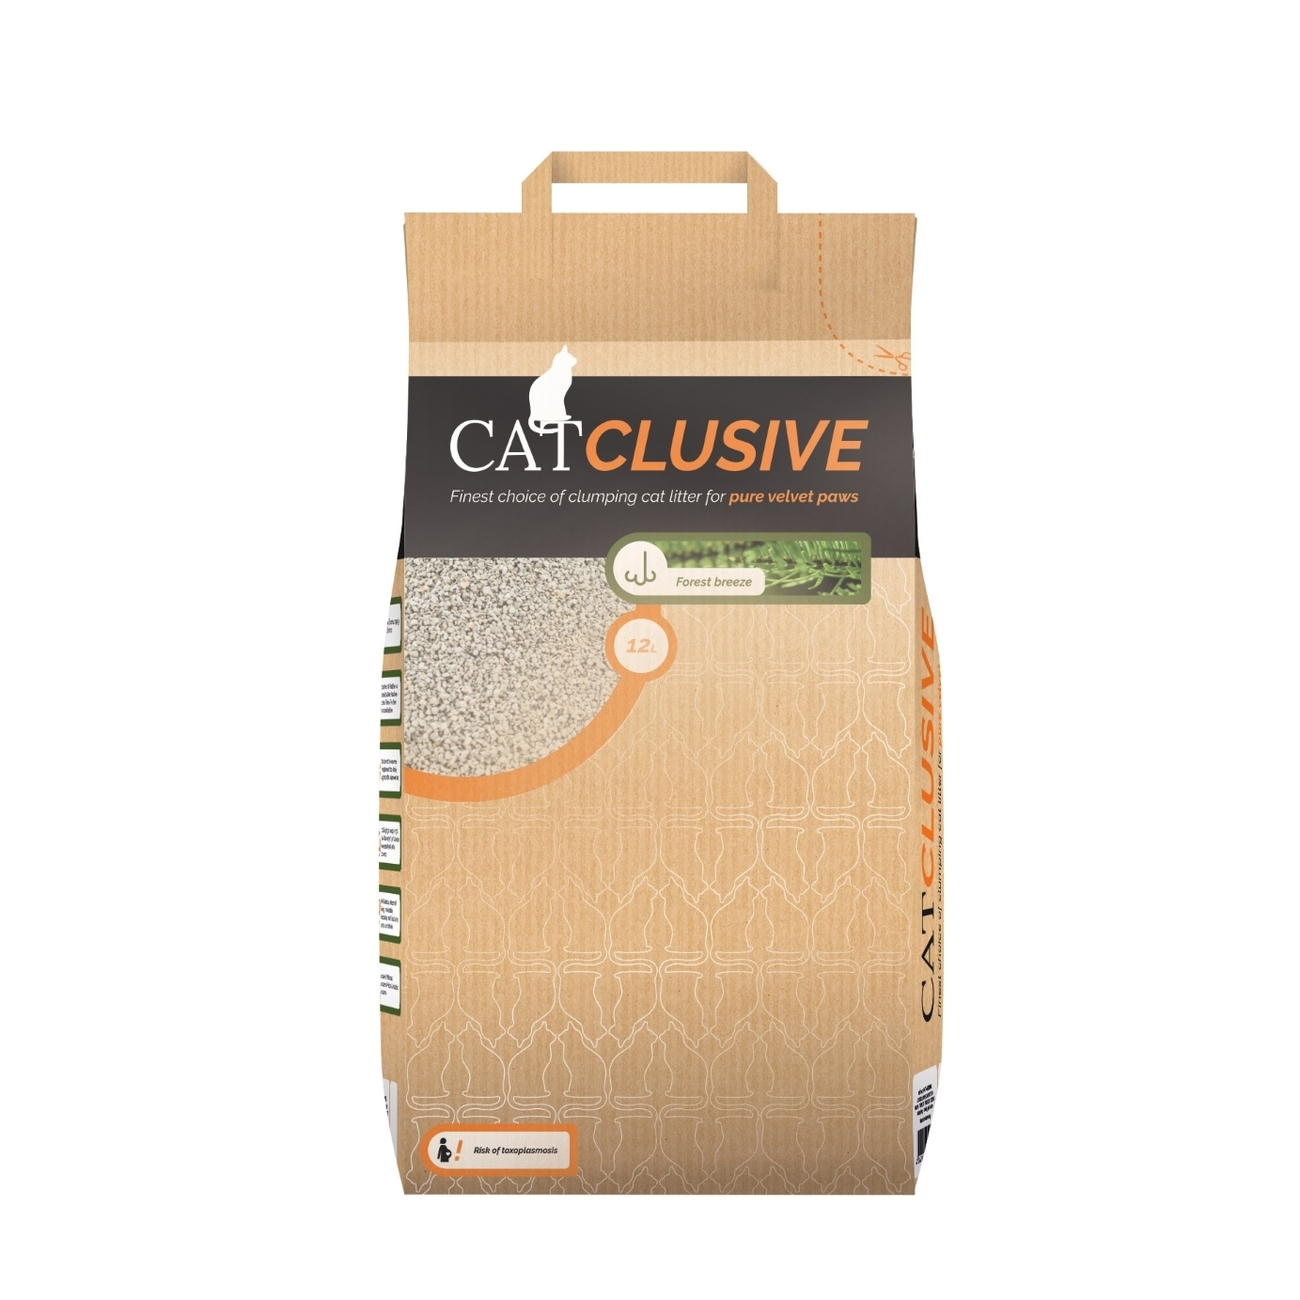 EBI Catclusive Katzenstreu Waldbriese, 12 Liter